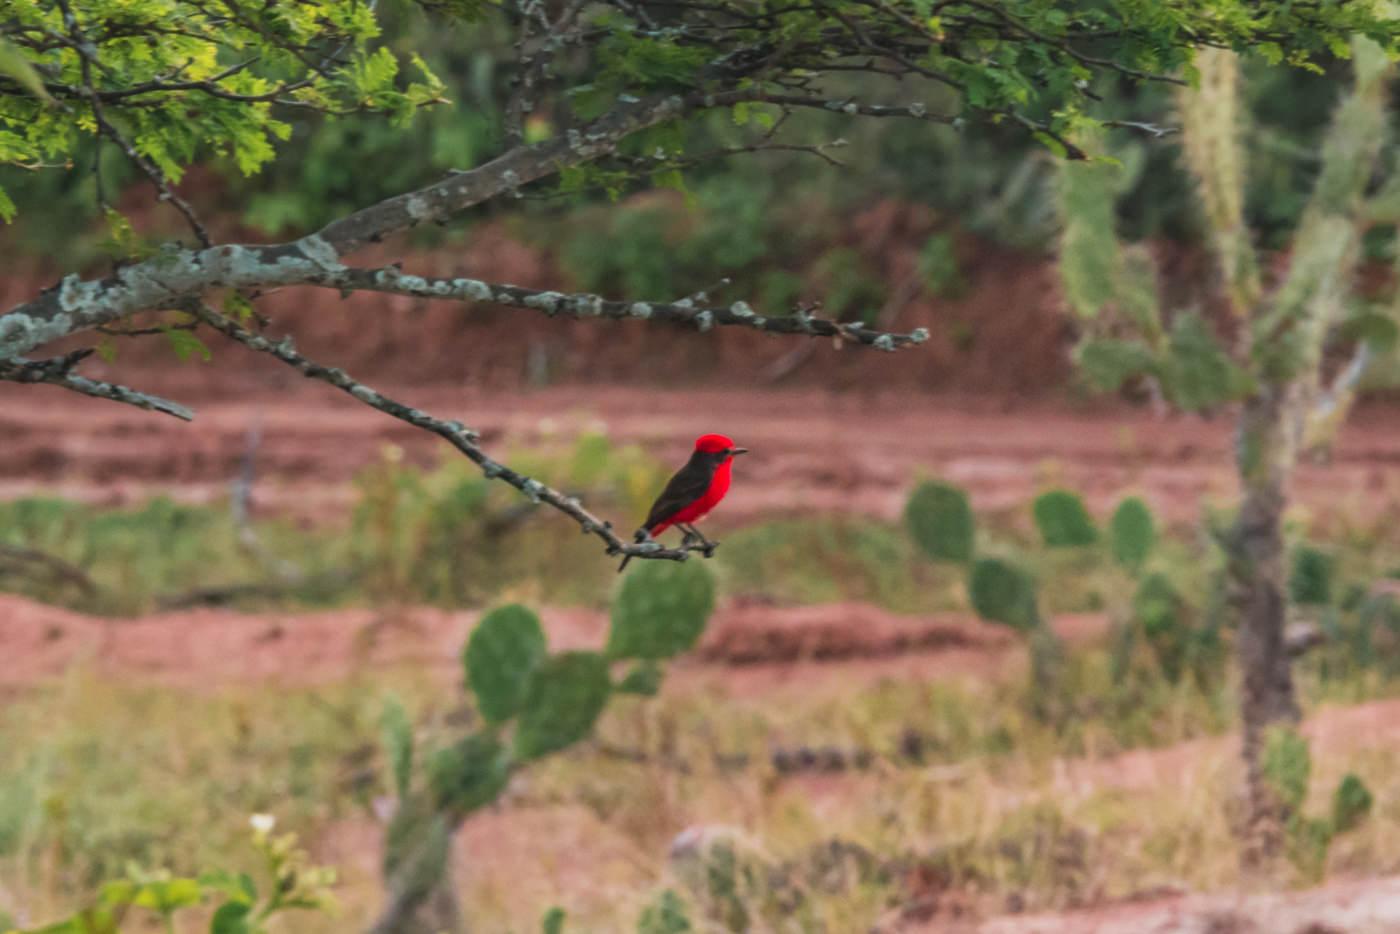 Ein Roter Vogel in der Tatacoa Wüste, Kolumbien